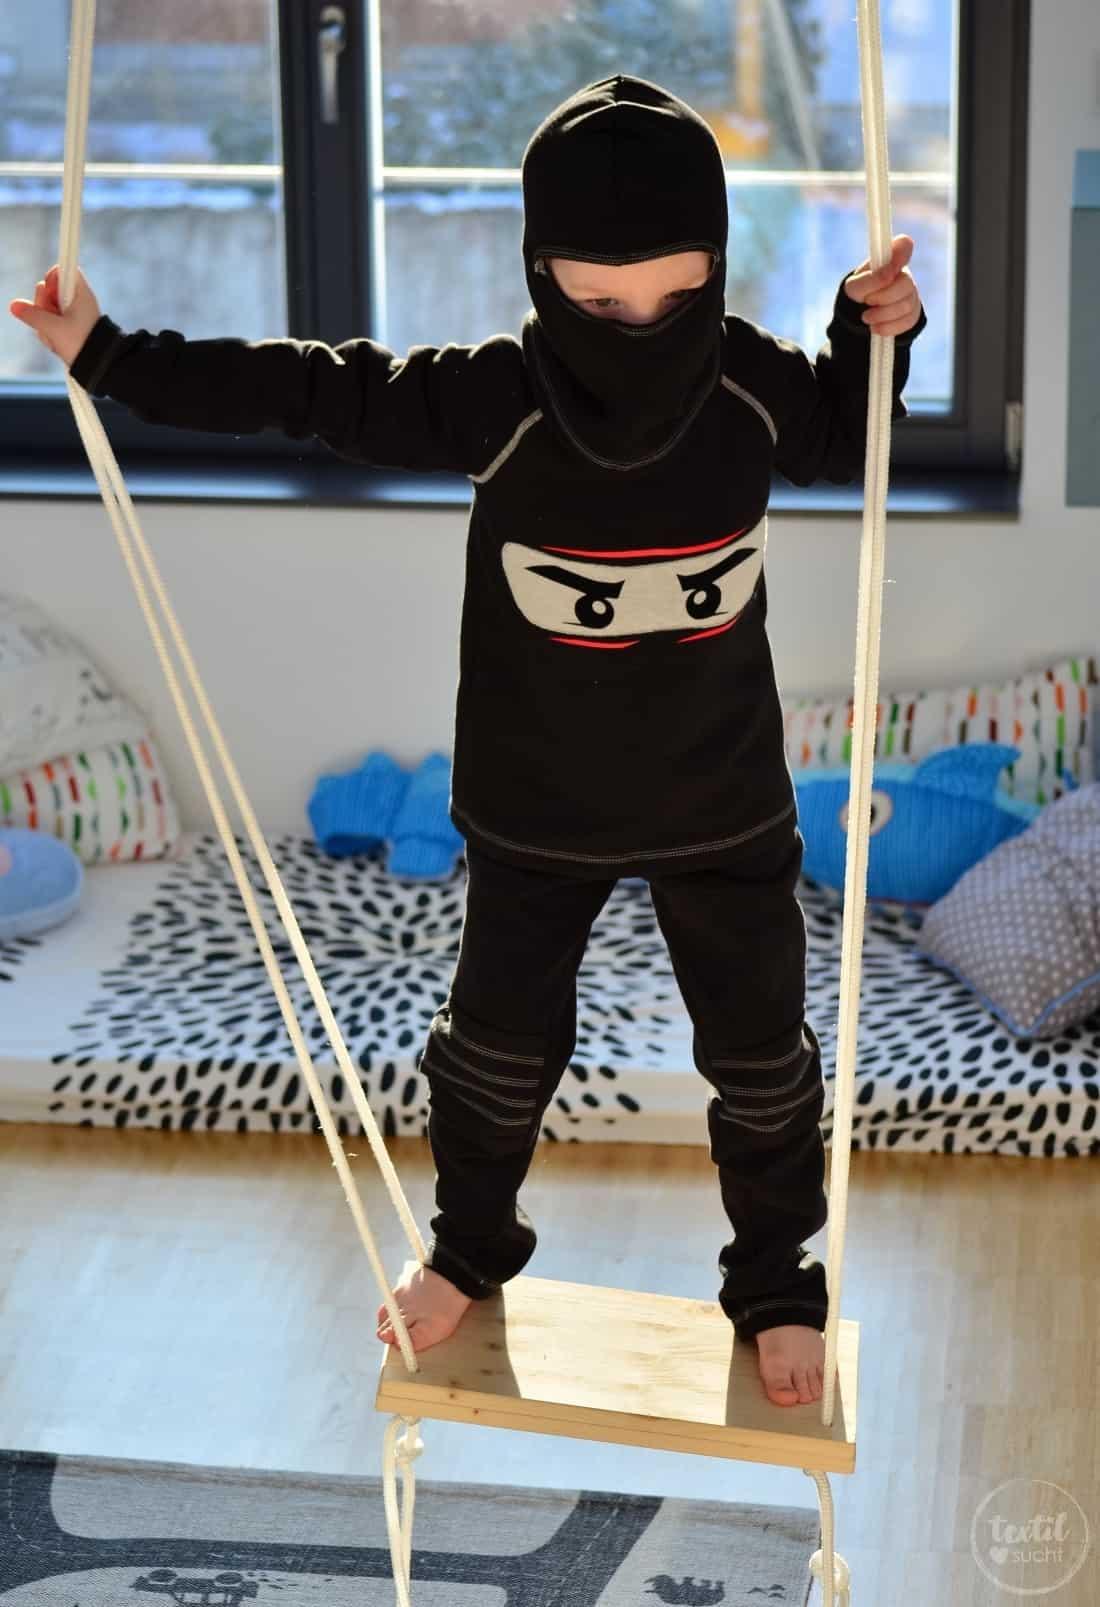 Faschingskostüm nähen: Ein selbstgenähtes Ninjakostüm » Textilsucht®